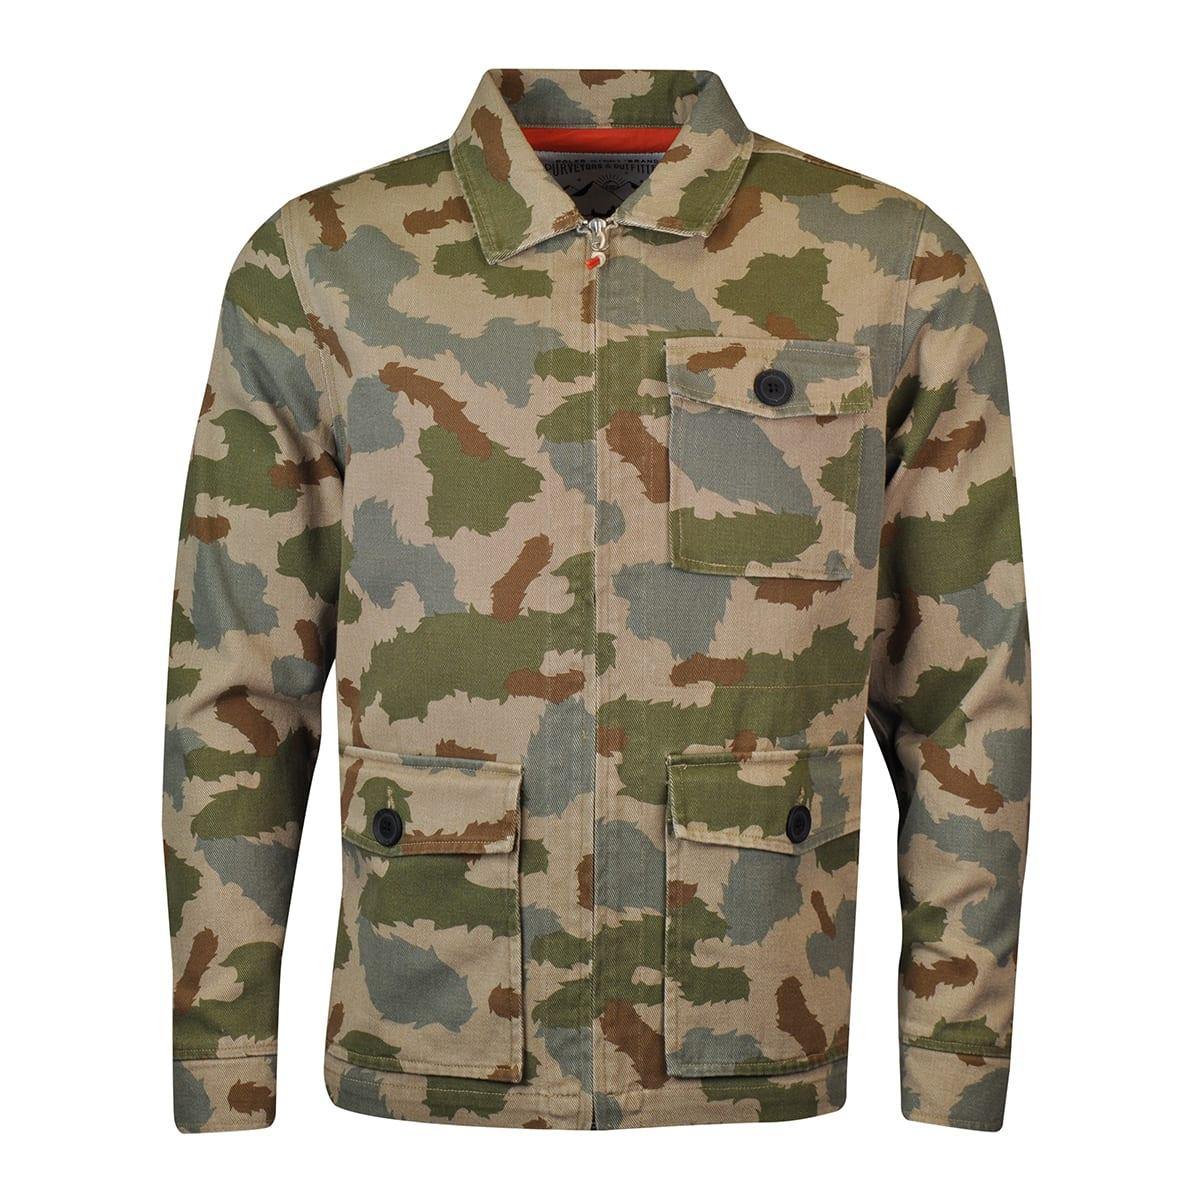 088044de8e9e5 Poler Flap Camo Jacket Camo - The Sporting Lodge